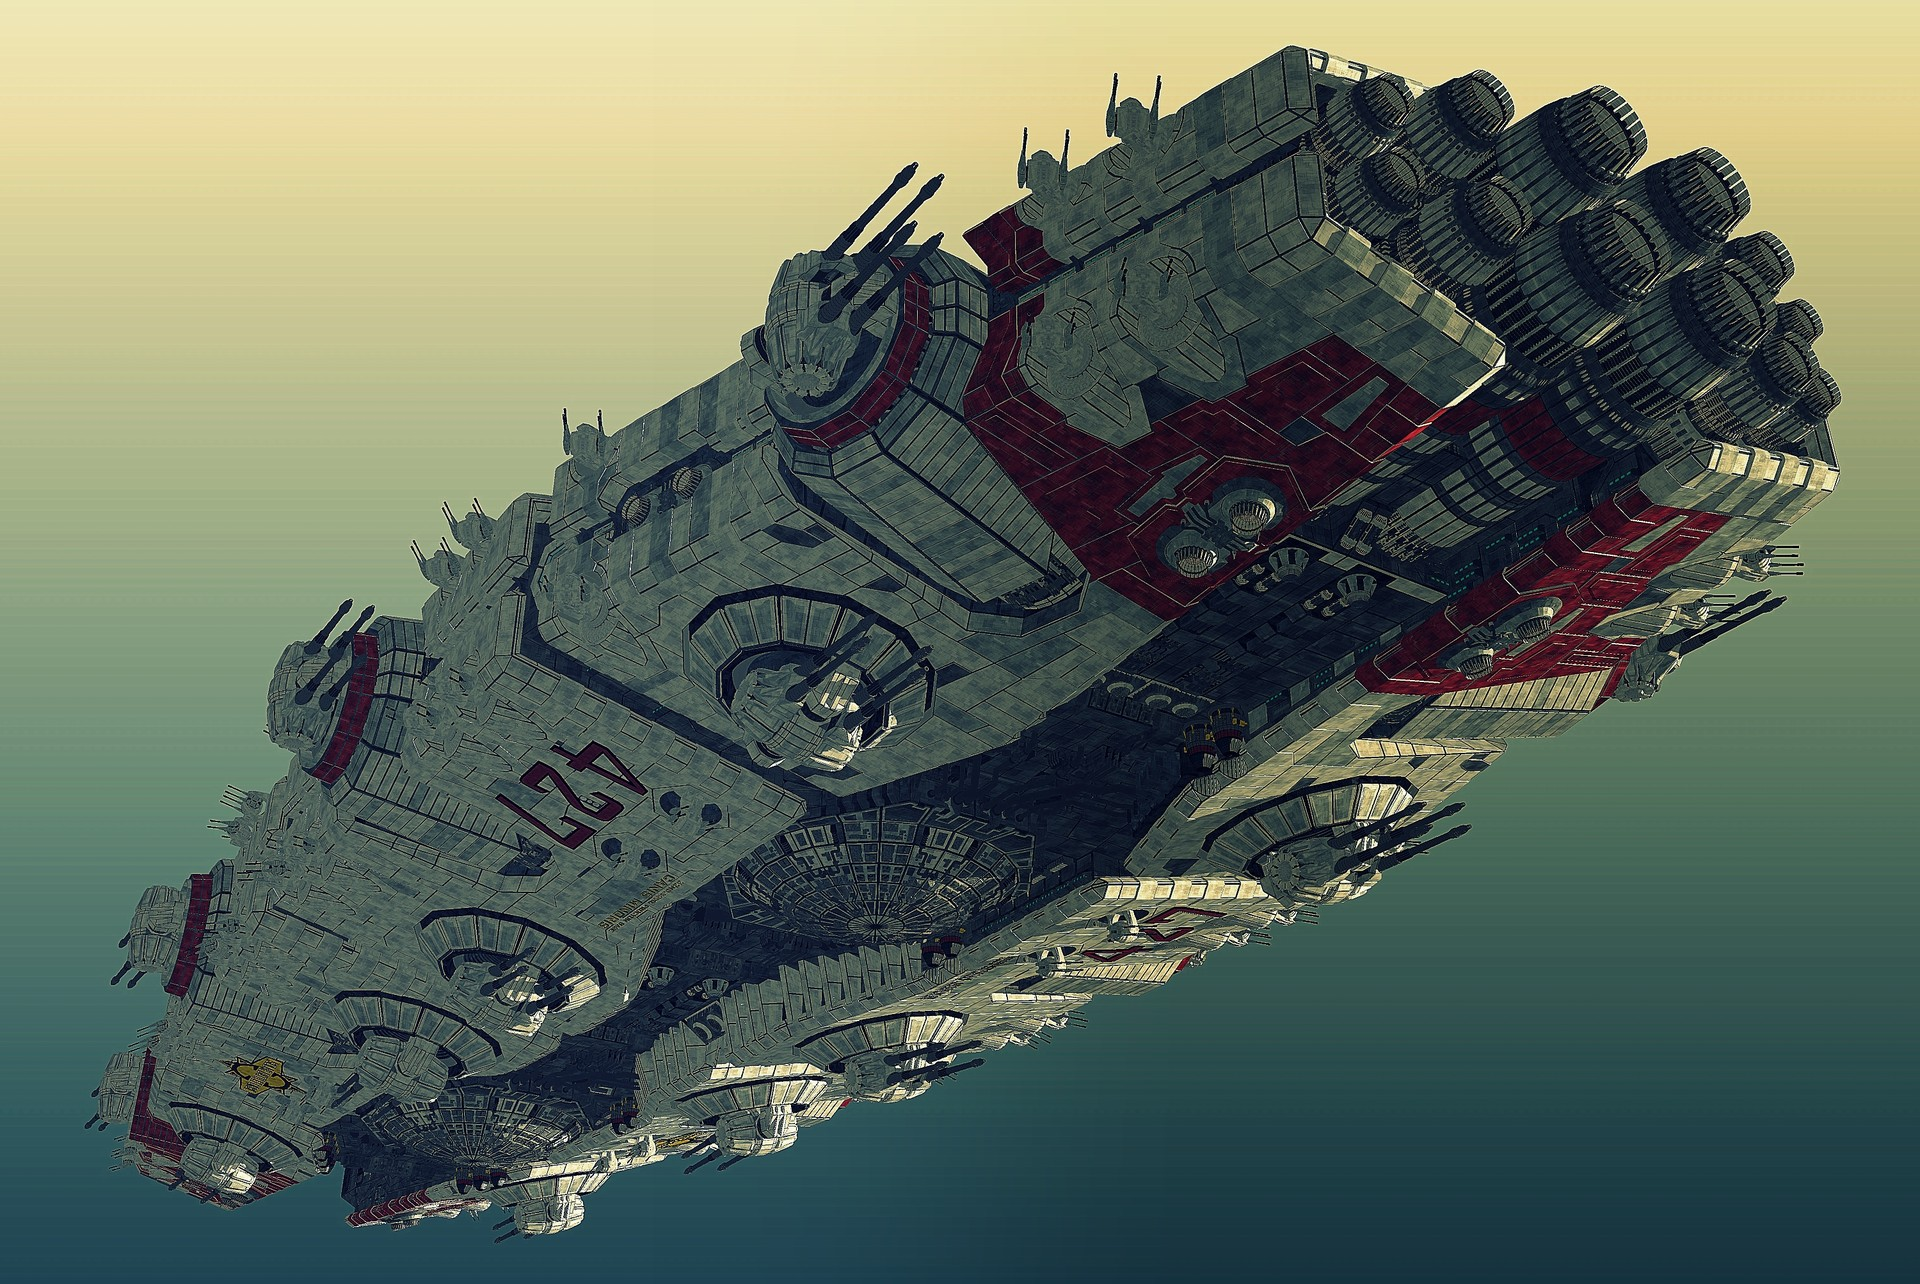 Joachim sverd prototype frigate28